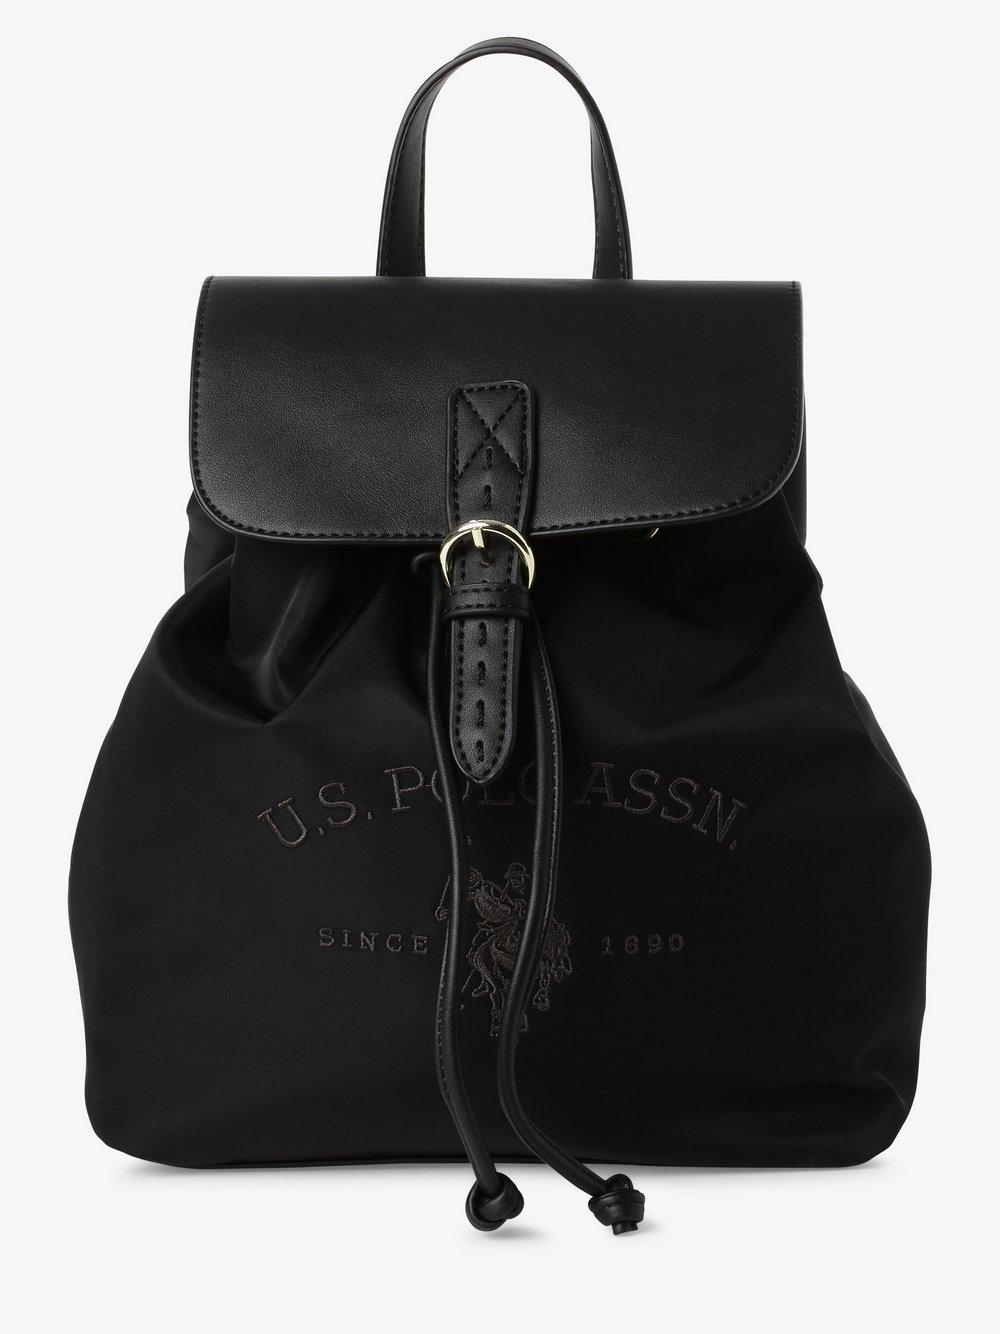 U.S. Polo Assn. – Plecak damski, czarny Van Graaf 466428-0001